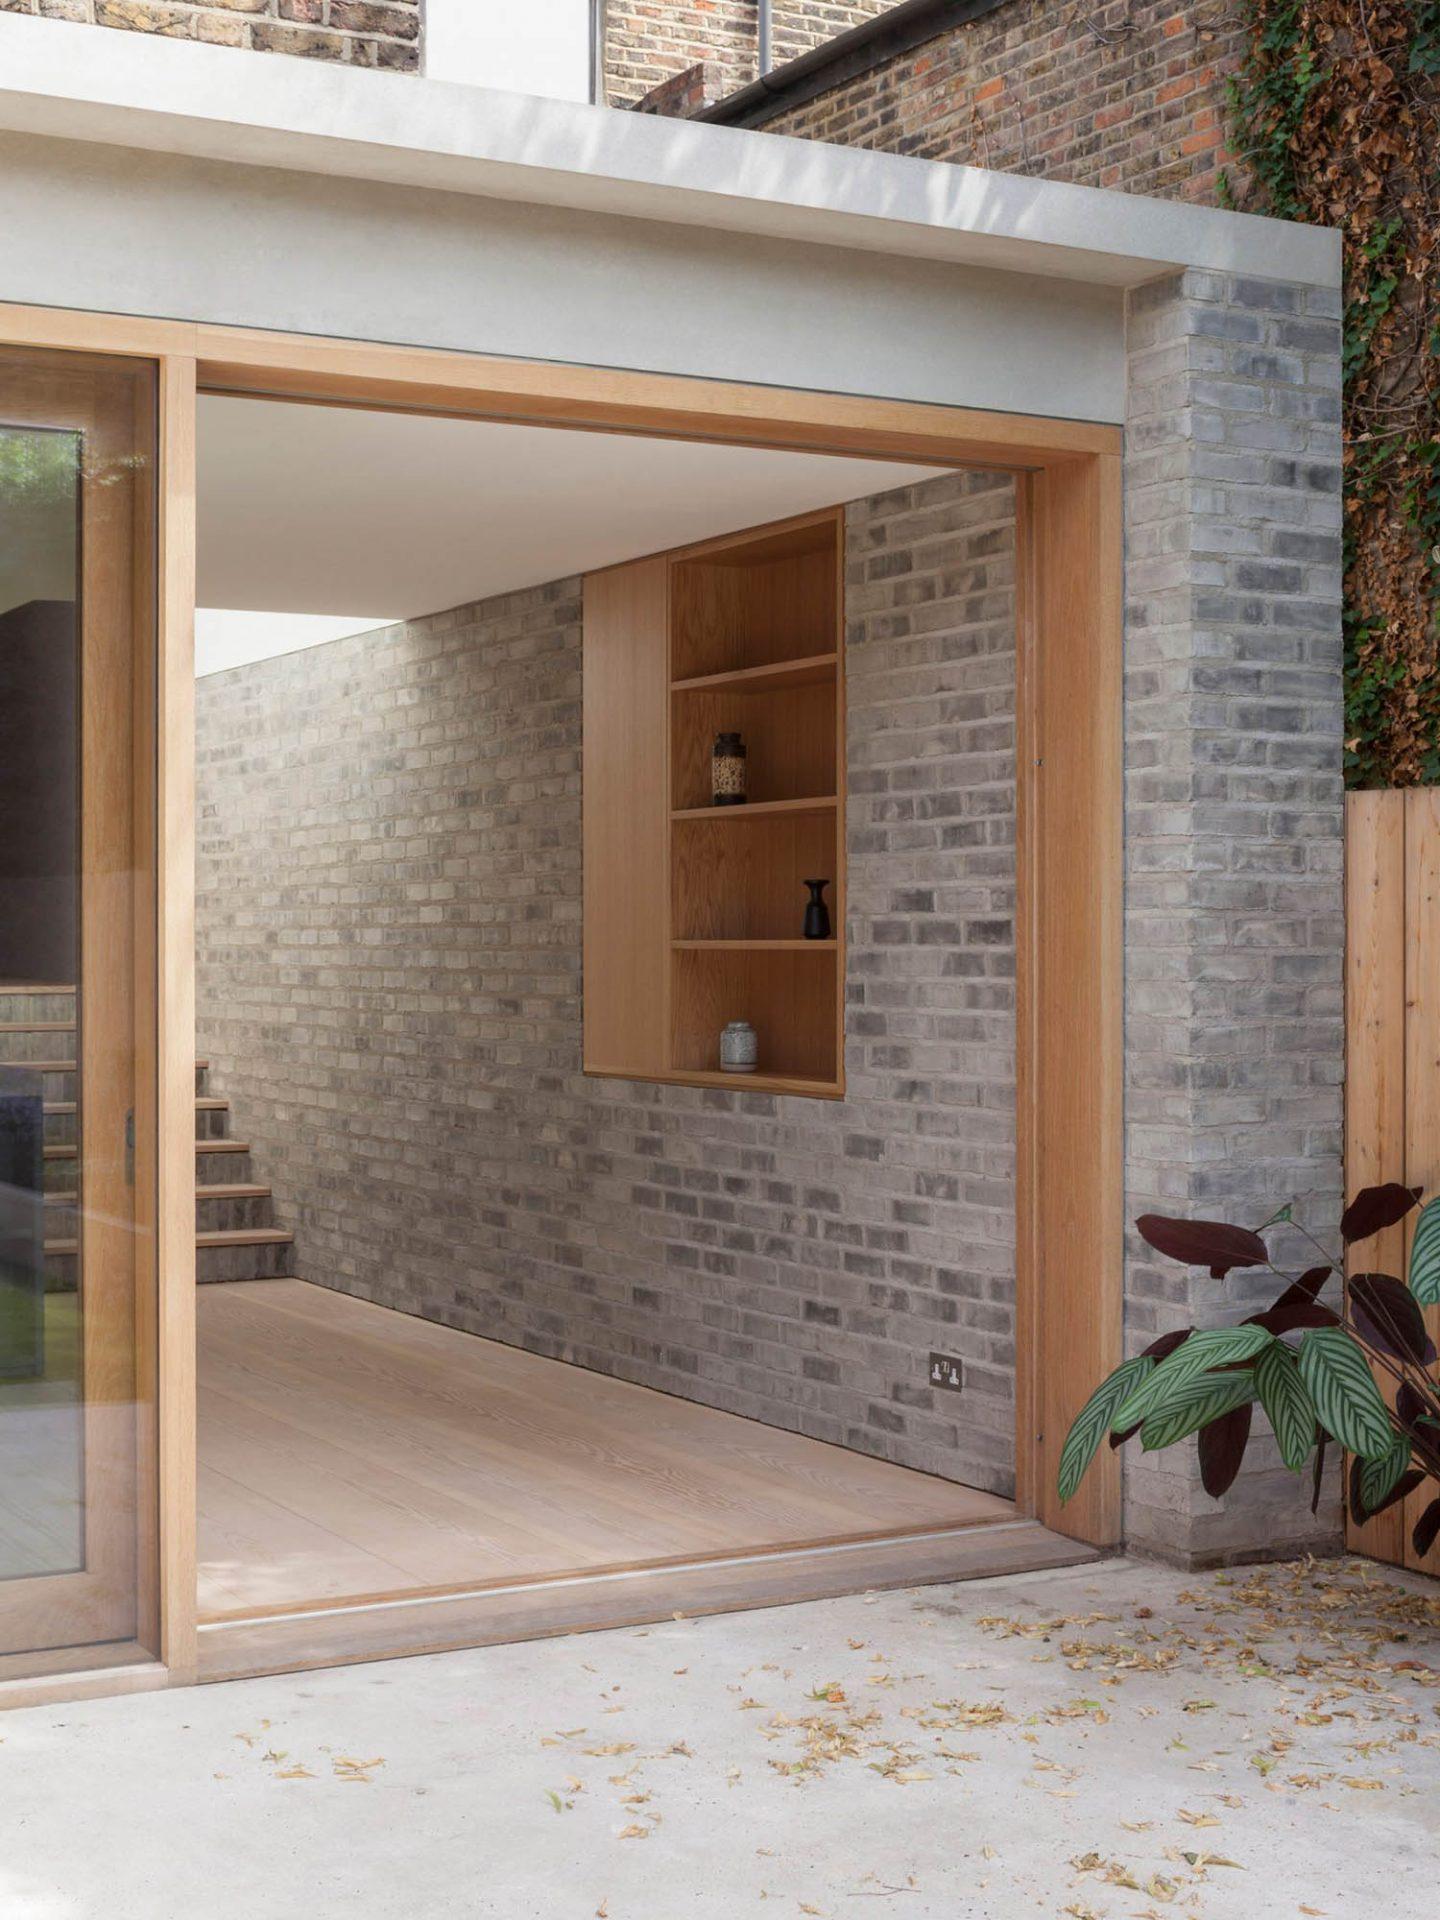 iGNANT_Architecture_AlJawad_Pike_London_Stoke_Newington_Renovation_6